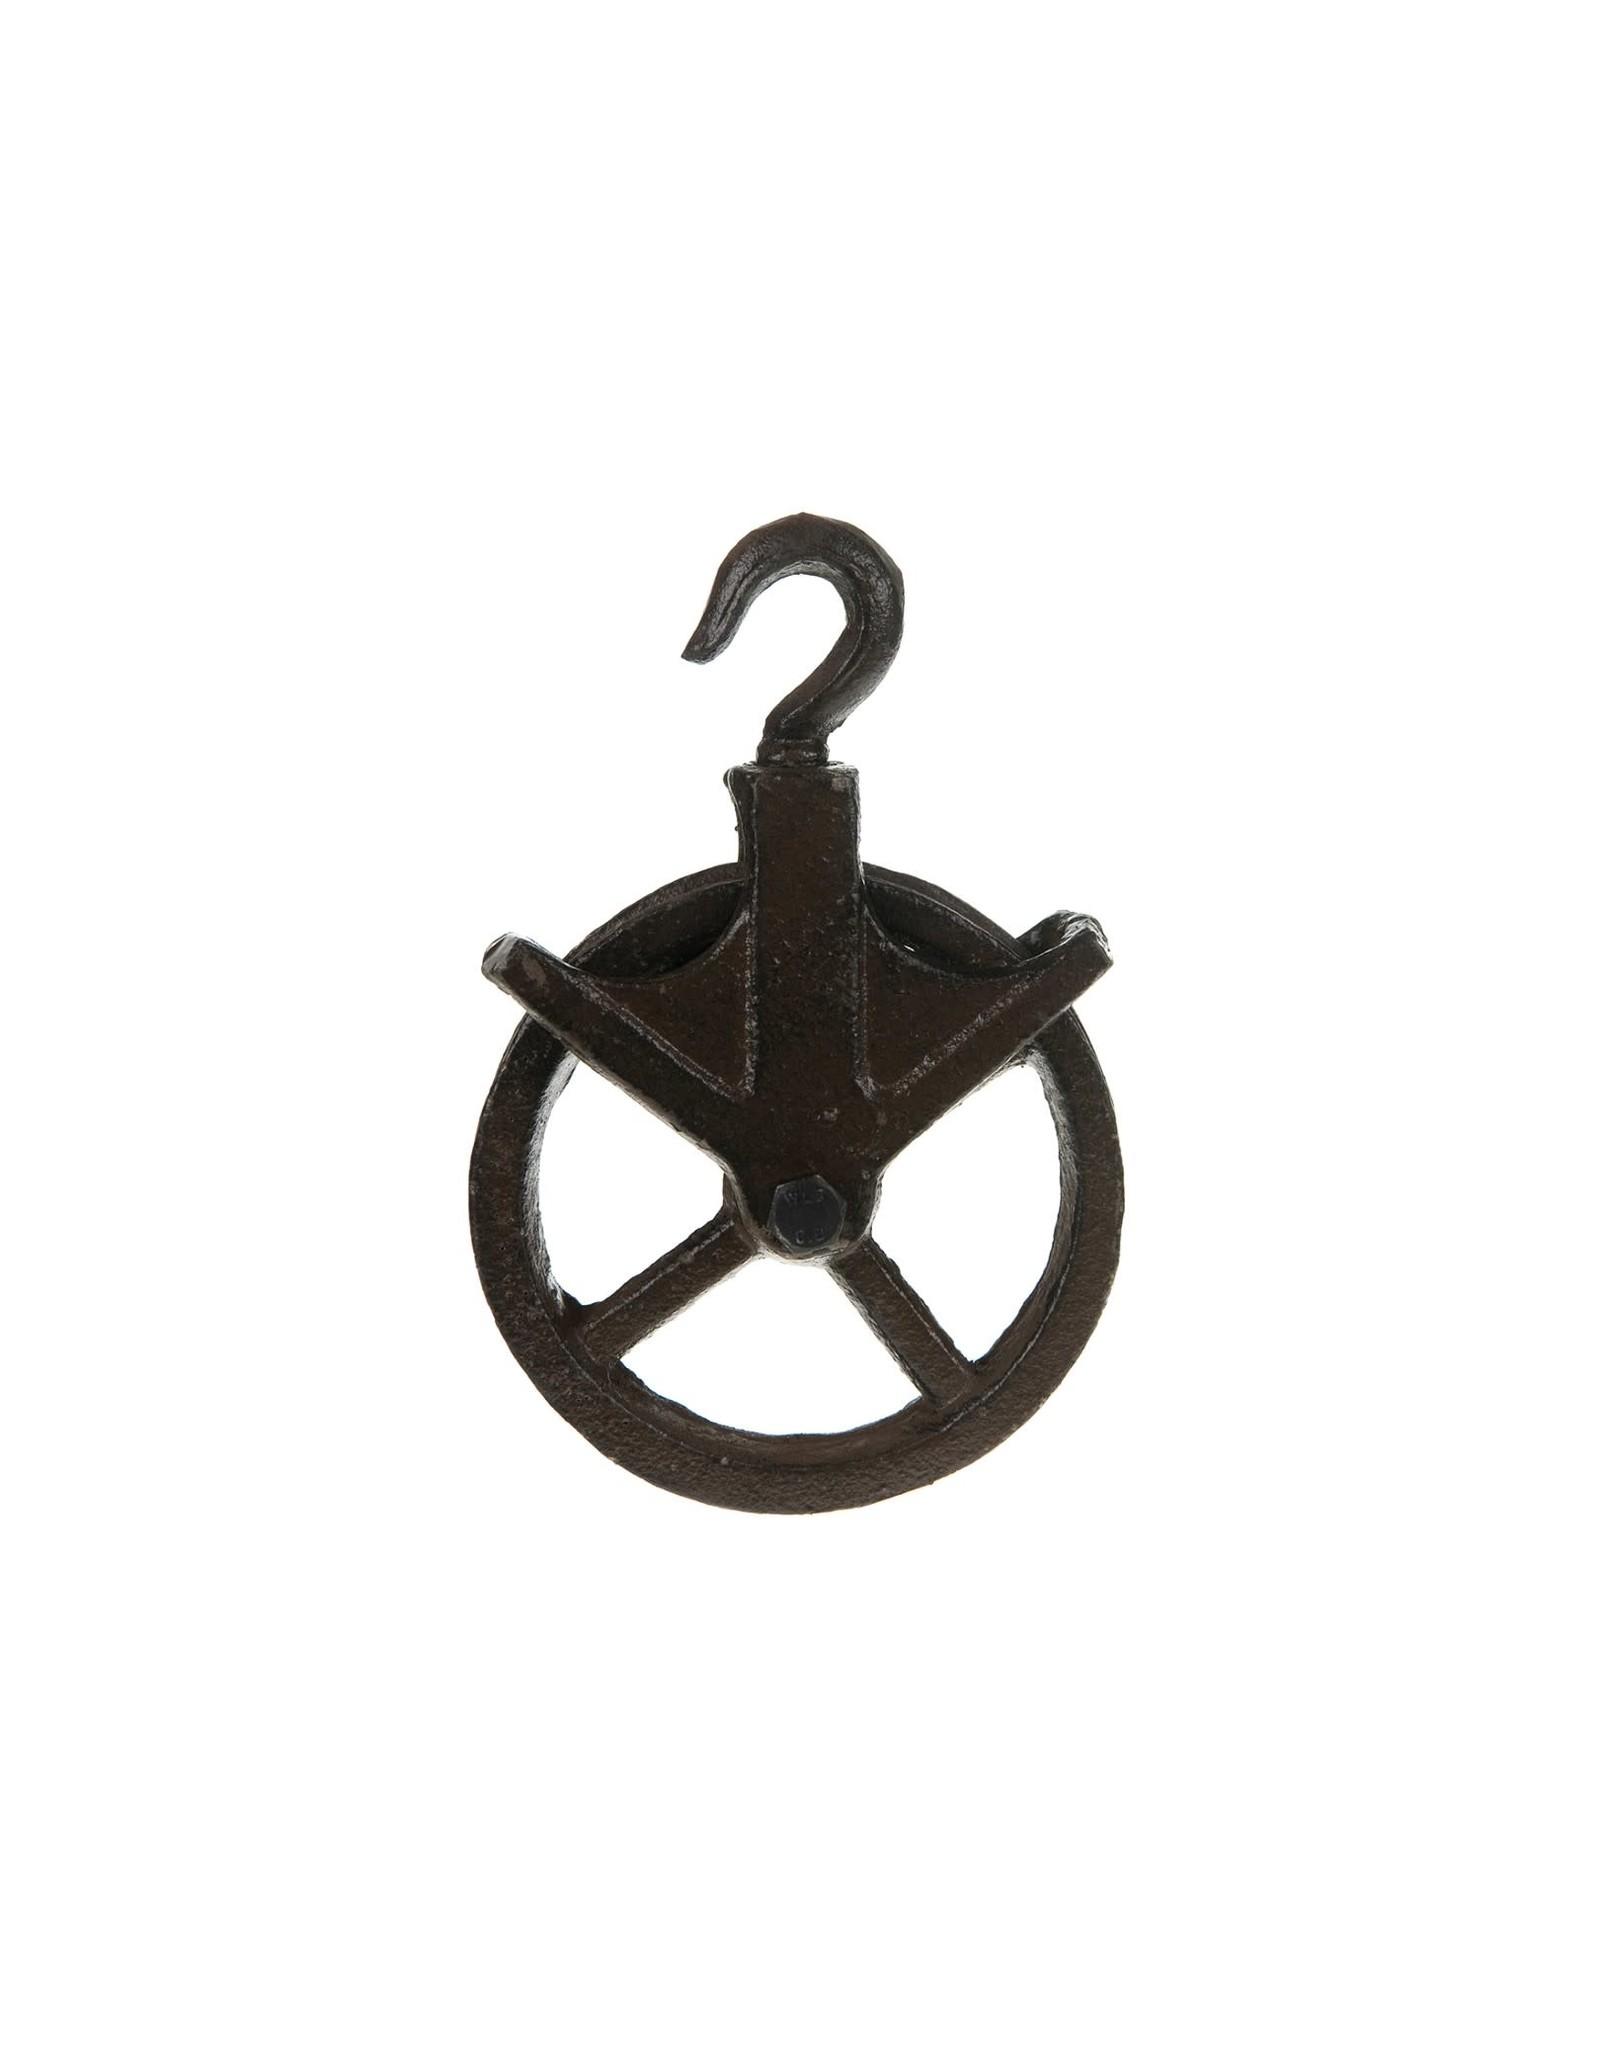 Dijk Hanging pulley cast iron dark brown 12x18x4.5cm